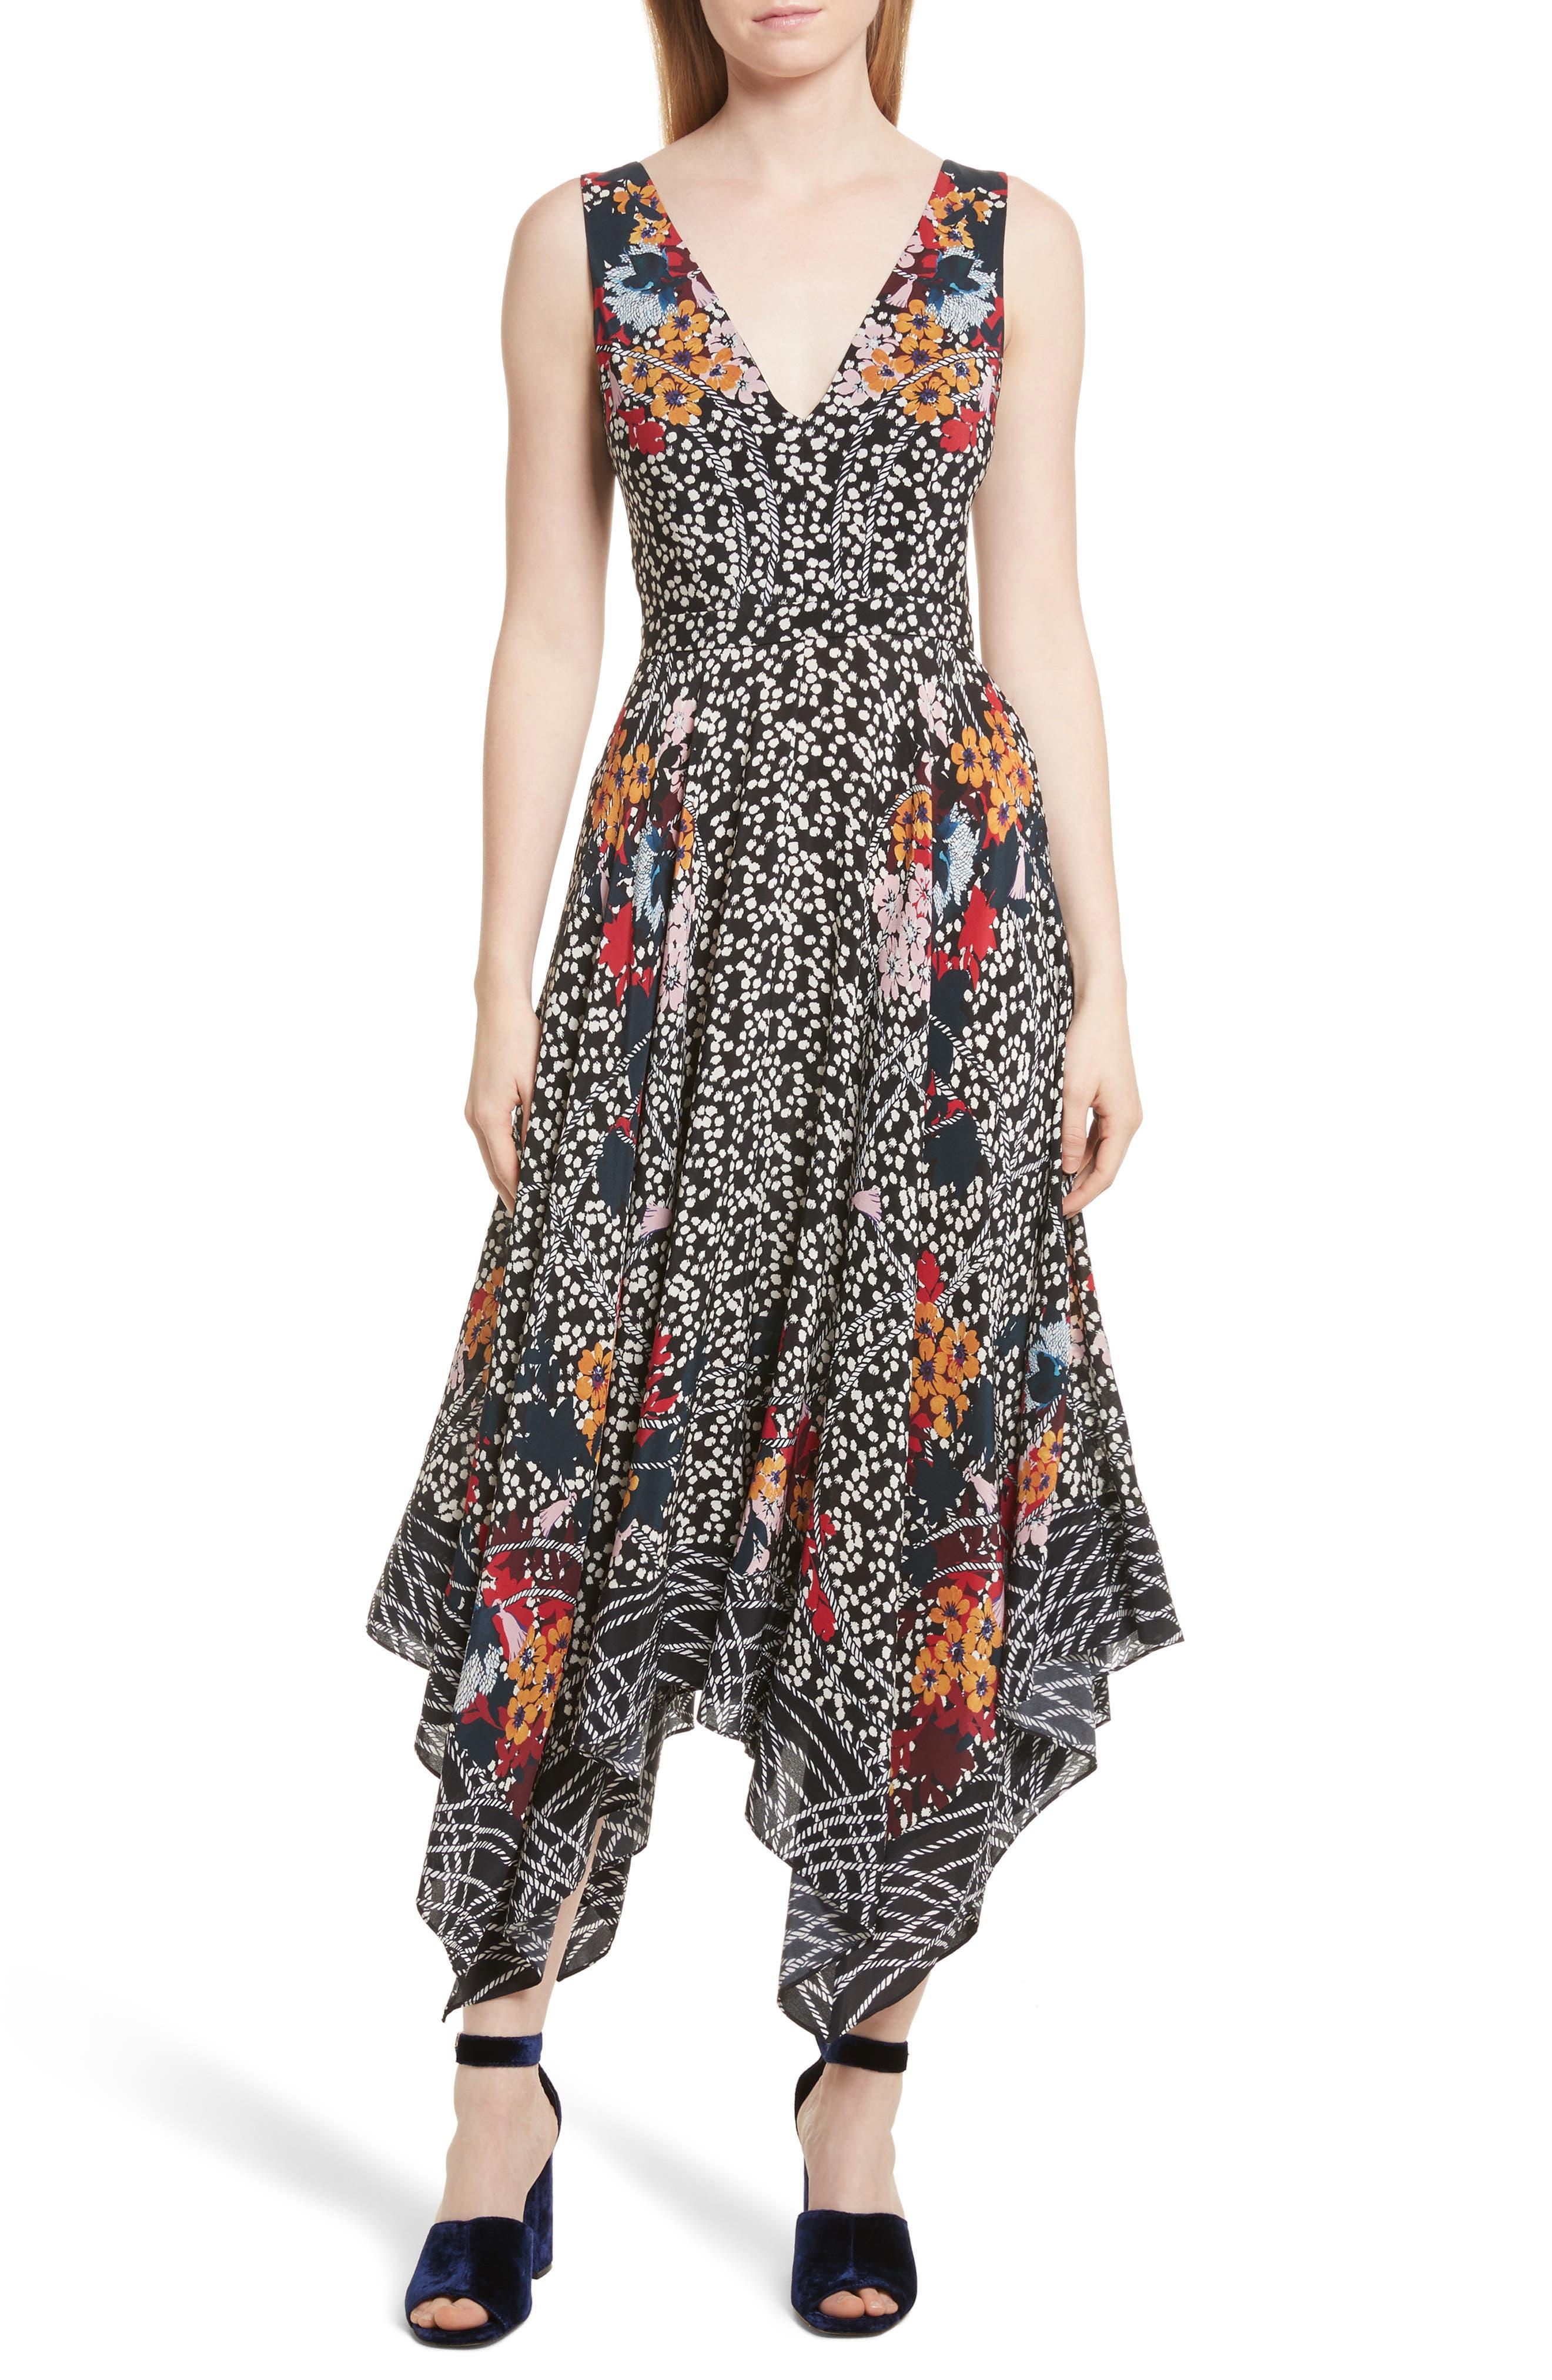 Alternate Image 1 Selected - SALONI Zuri Floral Print Dress